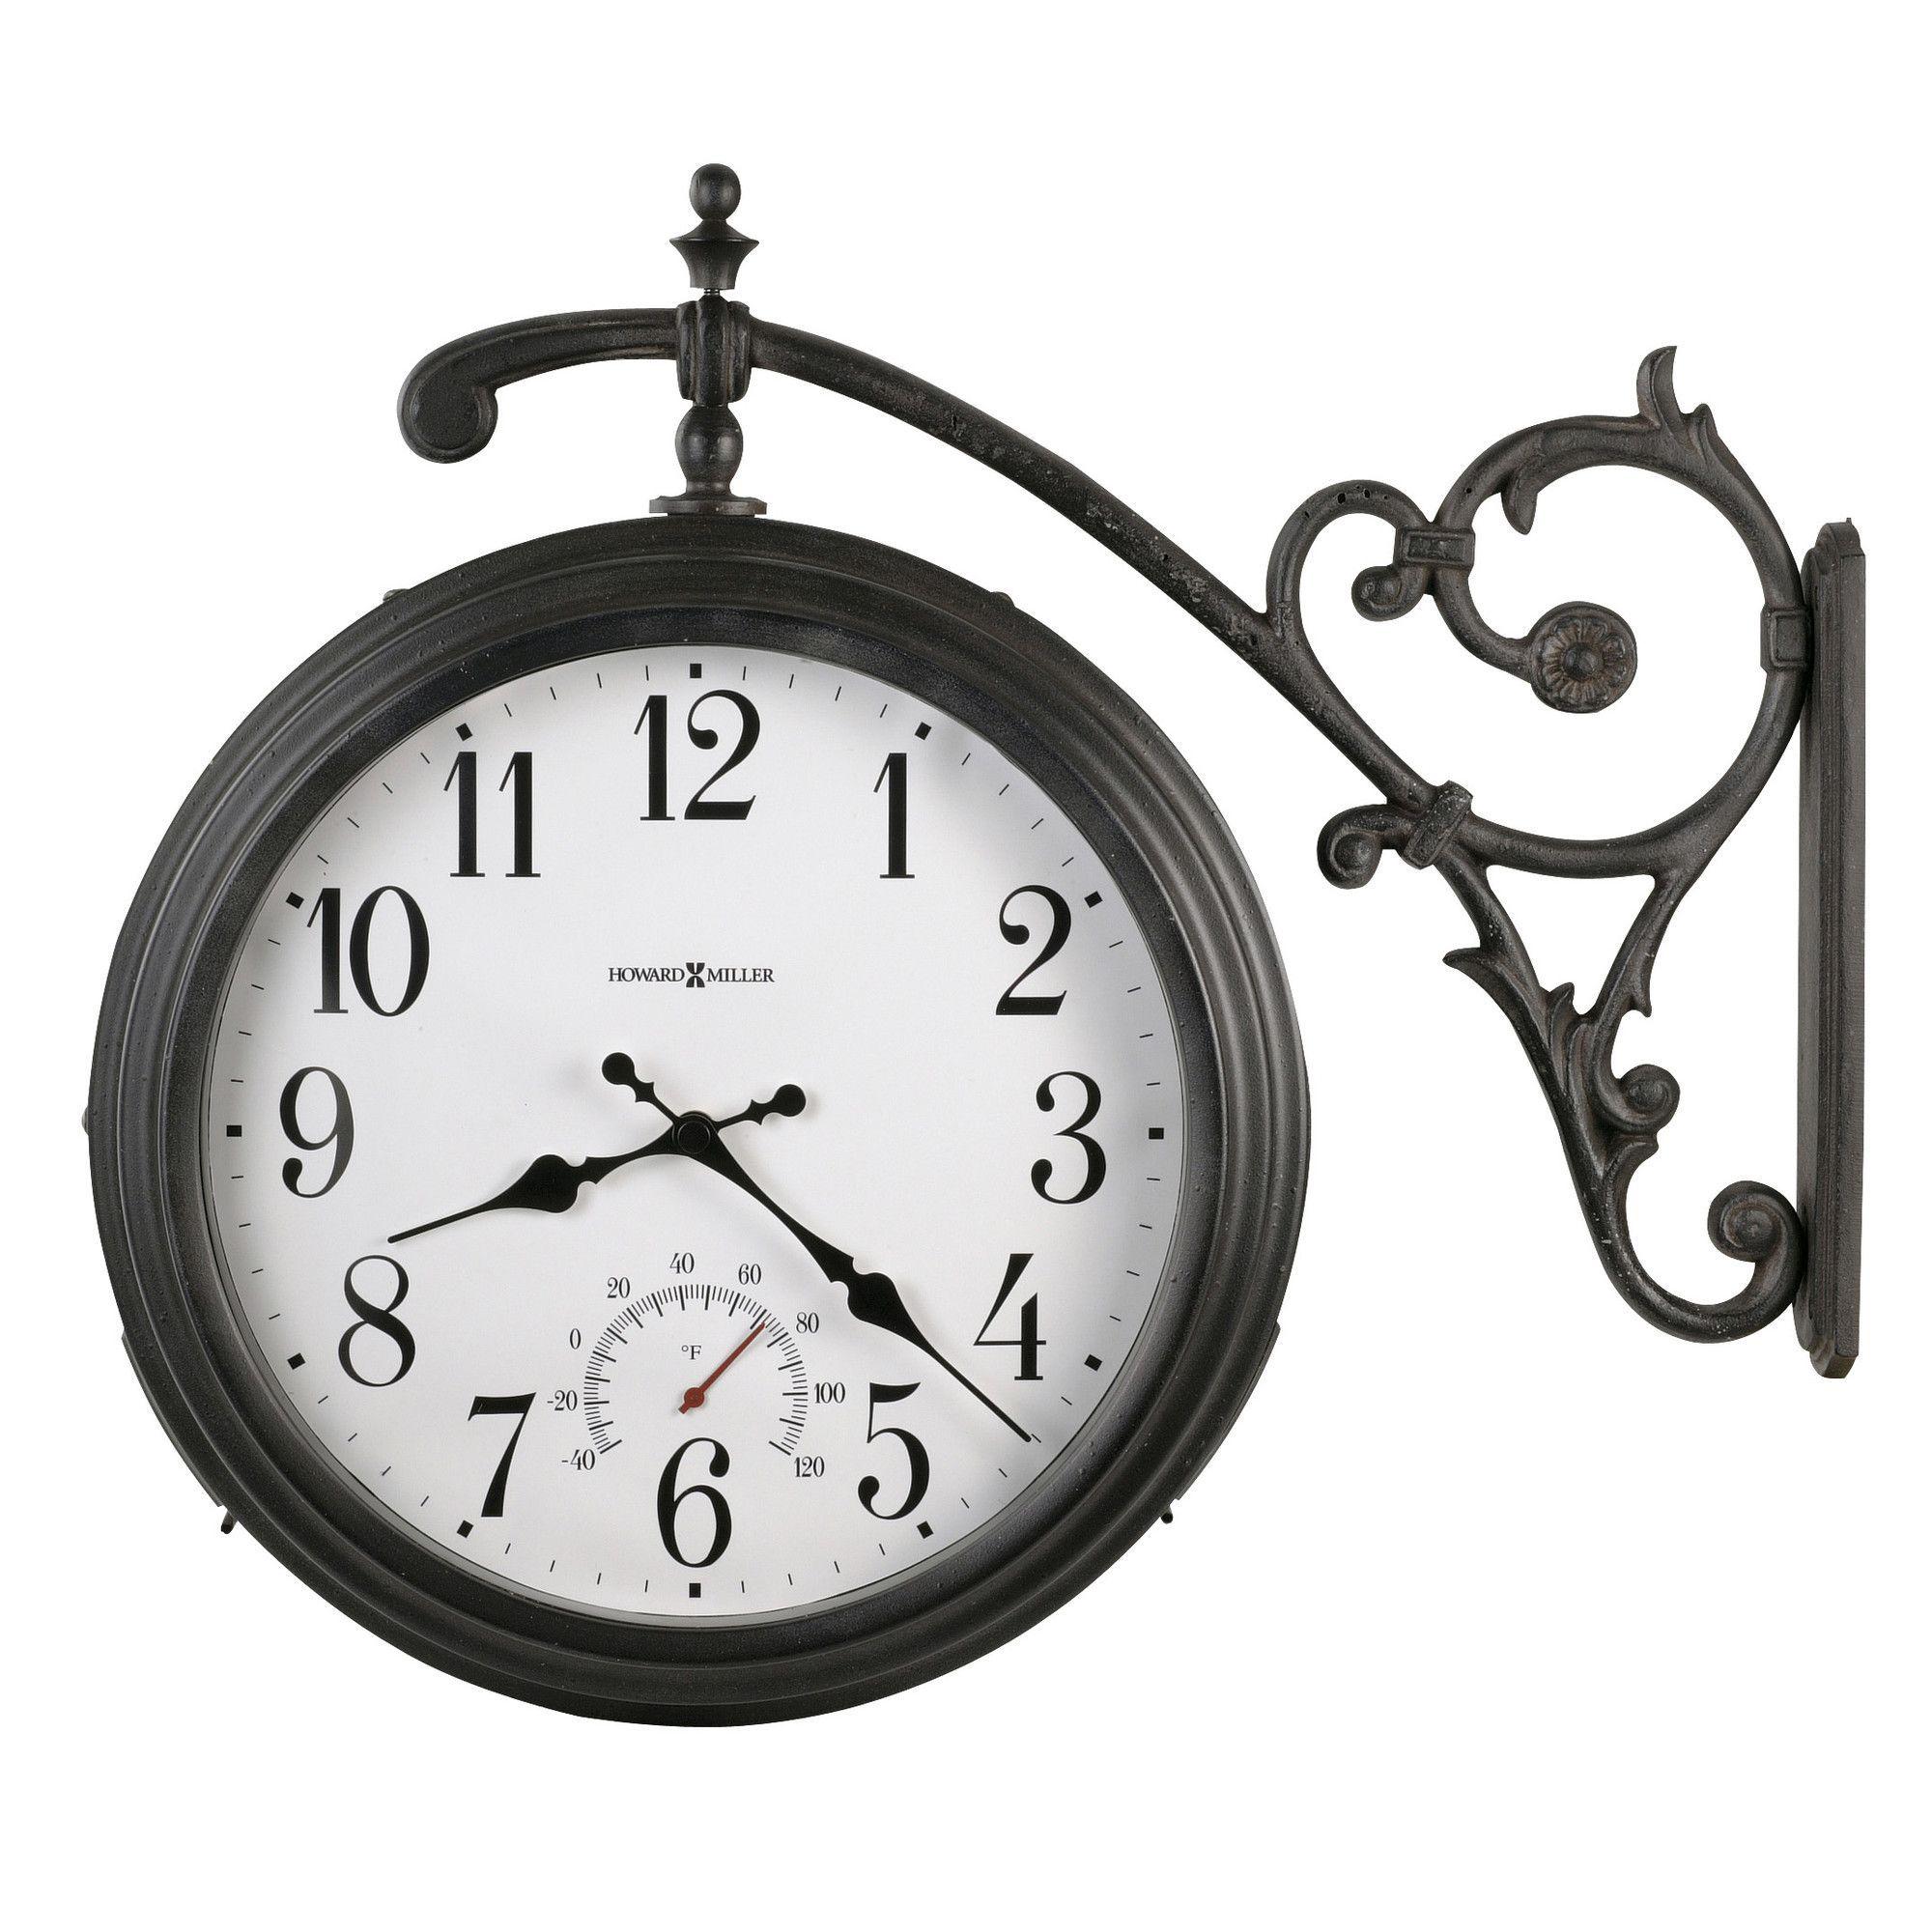 Indoor outdoor 1525 luis quartz wall clock signage indoor outdoor 1525 luis quartz wall clock amipublicfo Choice Image